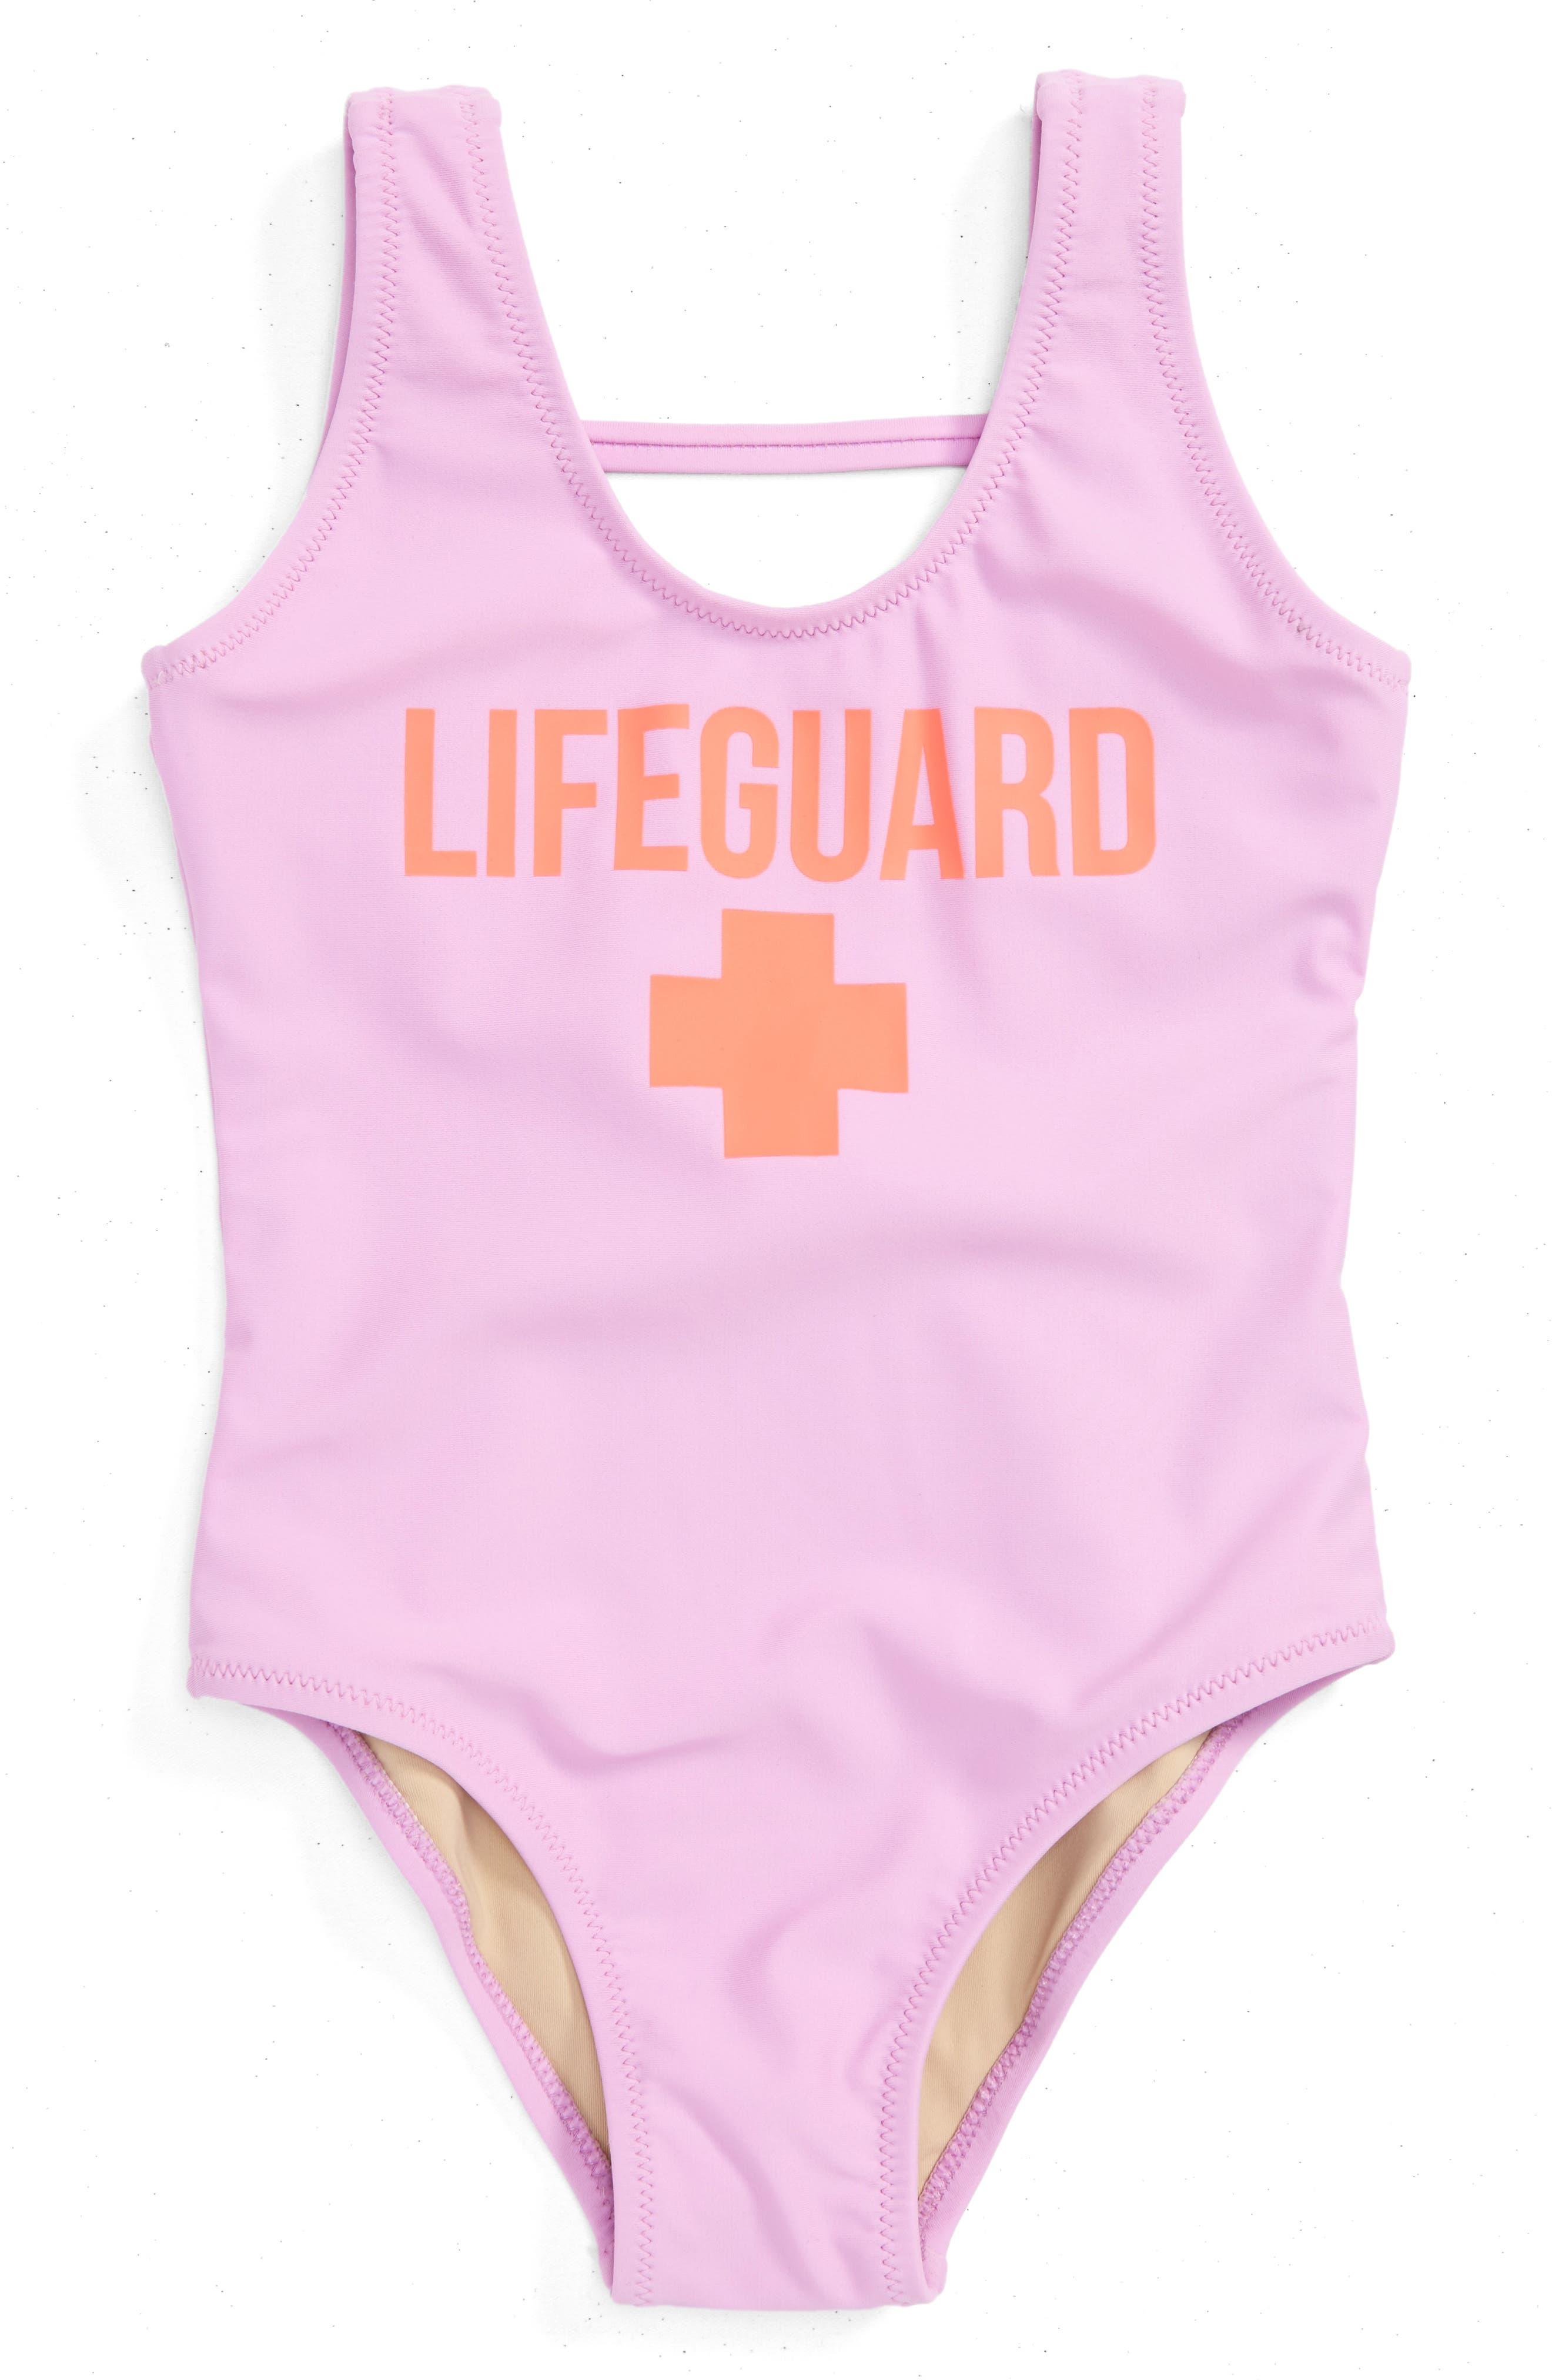 Lifeguard One-Piece Swimsuit,                         Main,                         color, Lilac